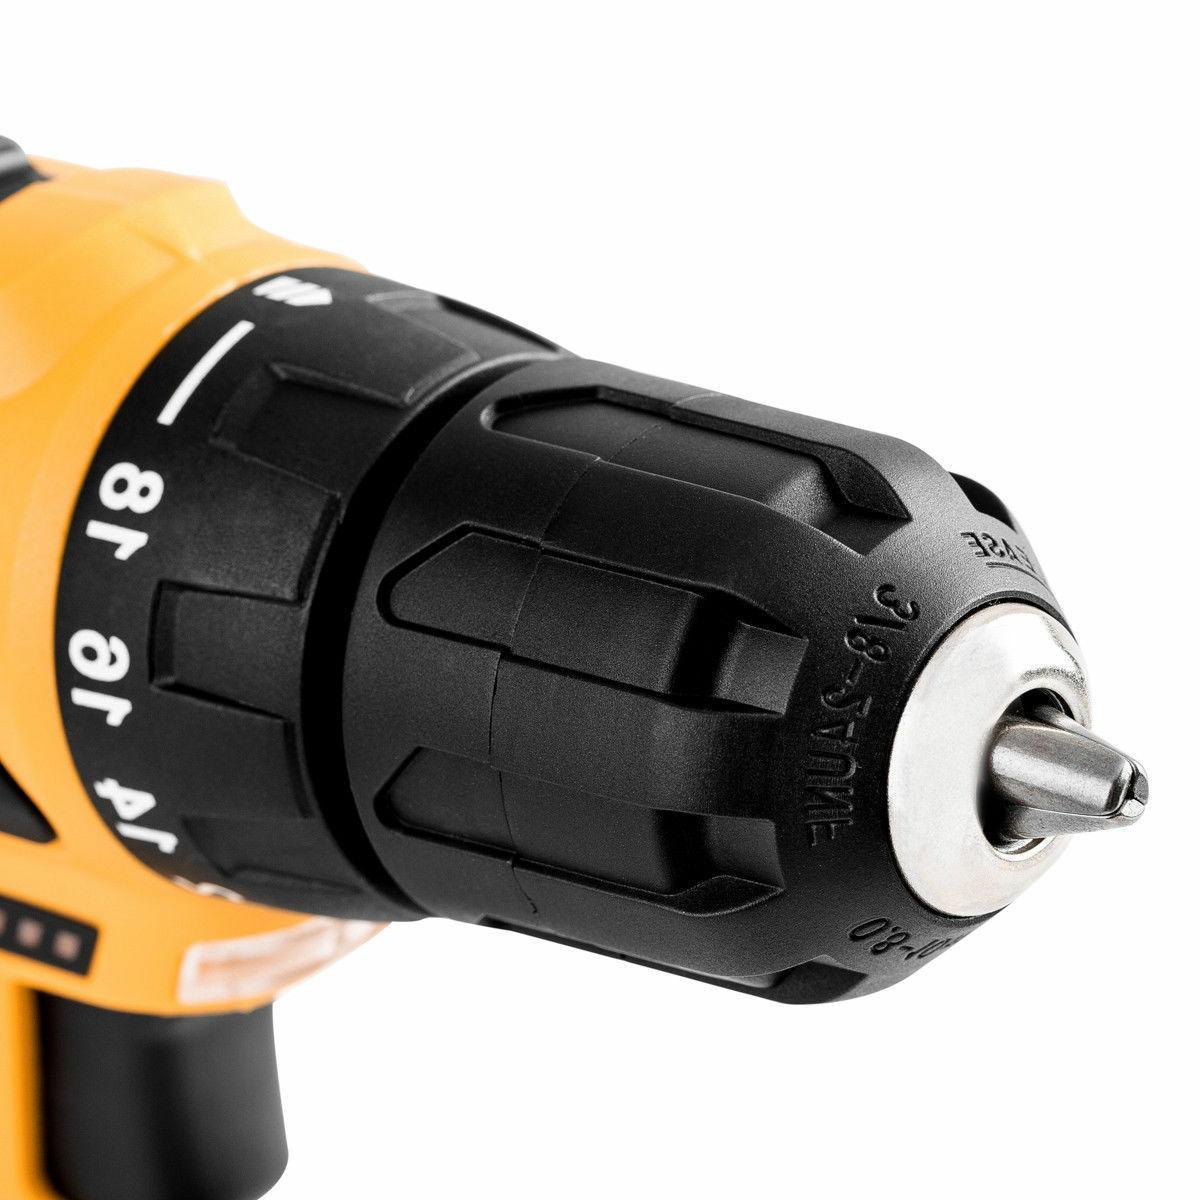 DEKO 12V 18+1 Driver Cordless 2-Speed Drill